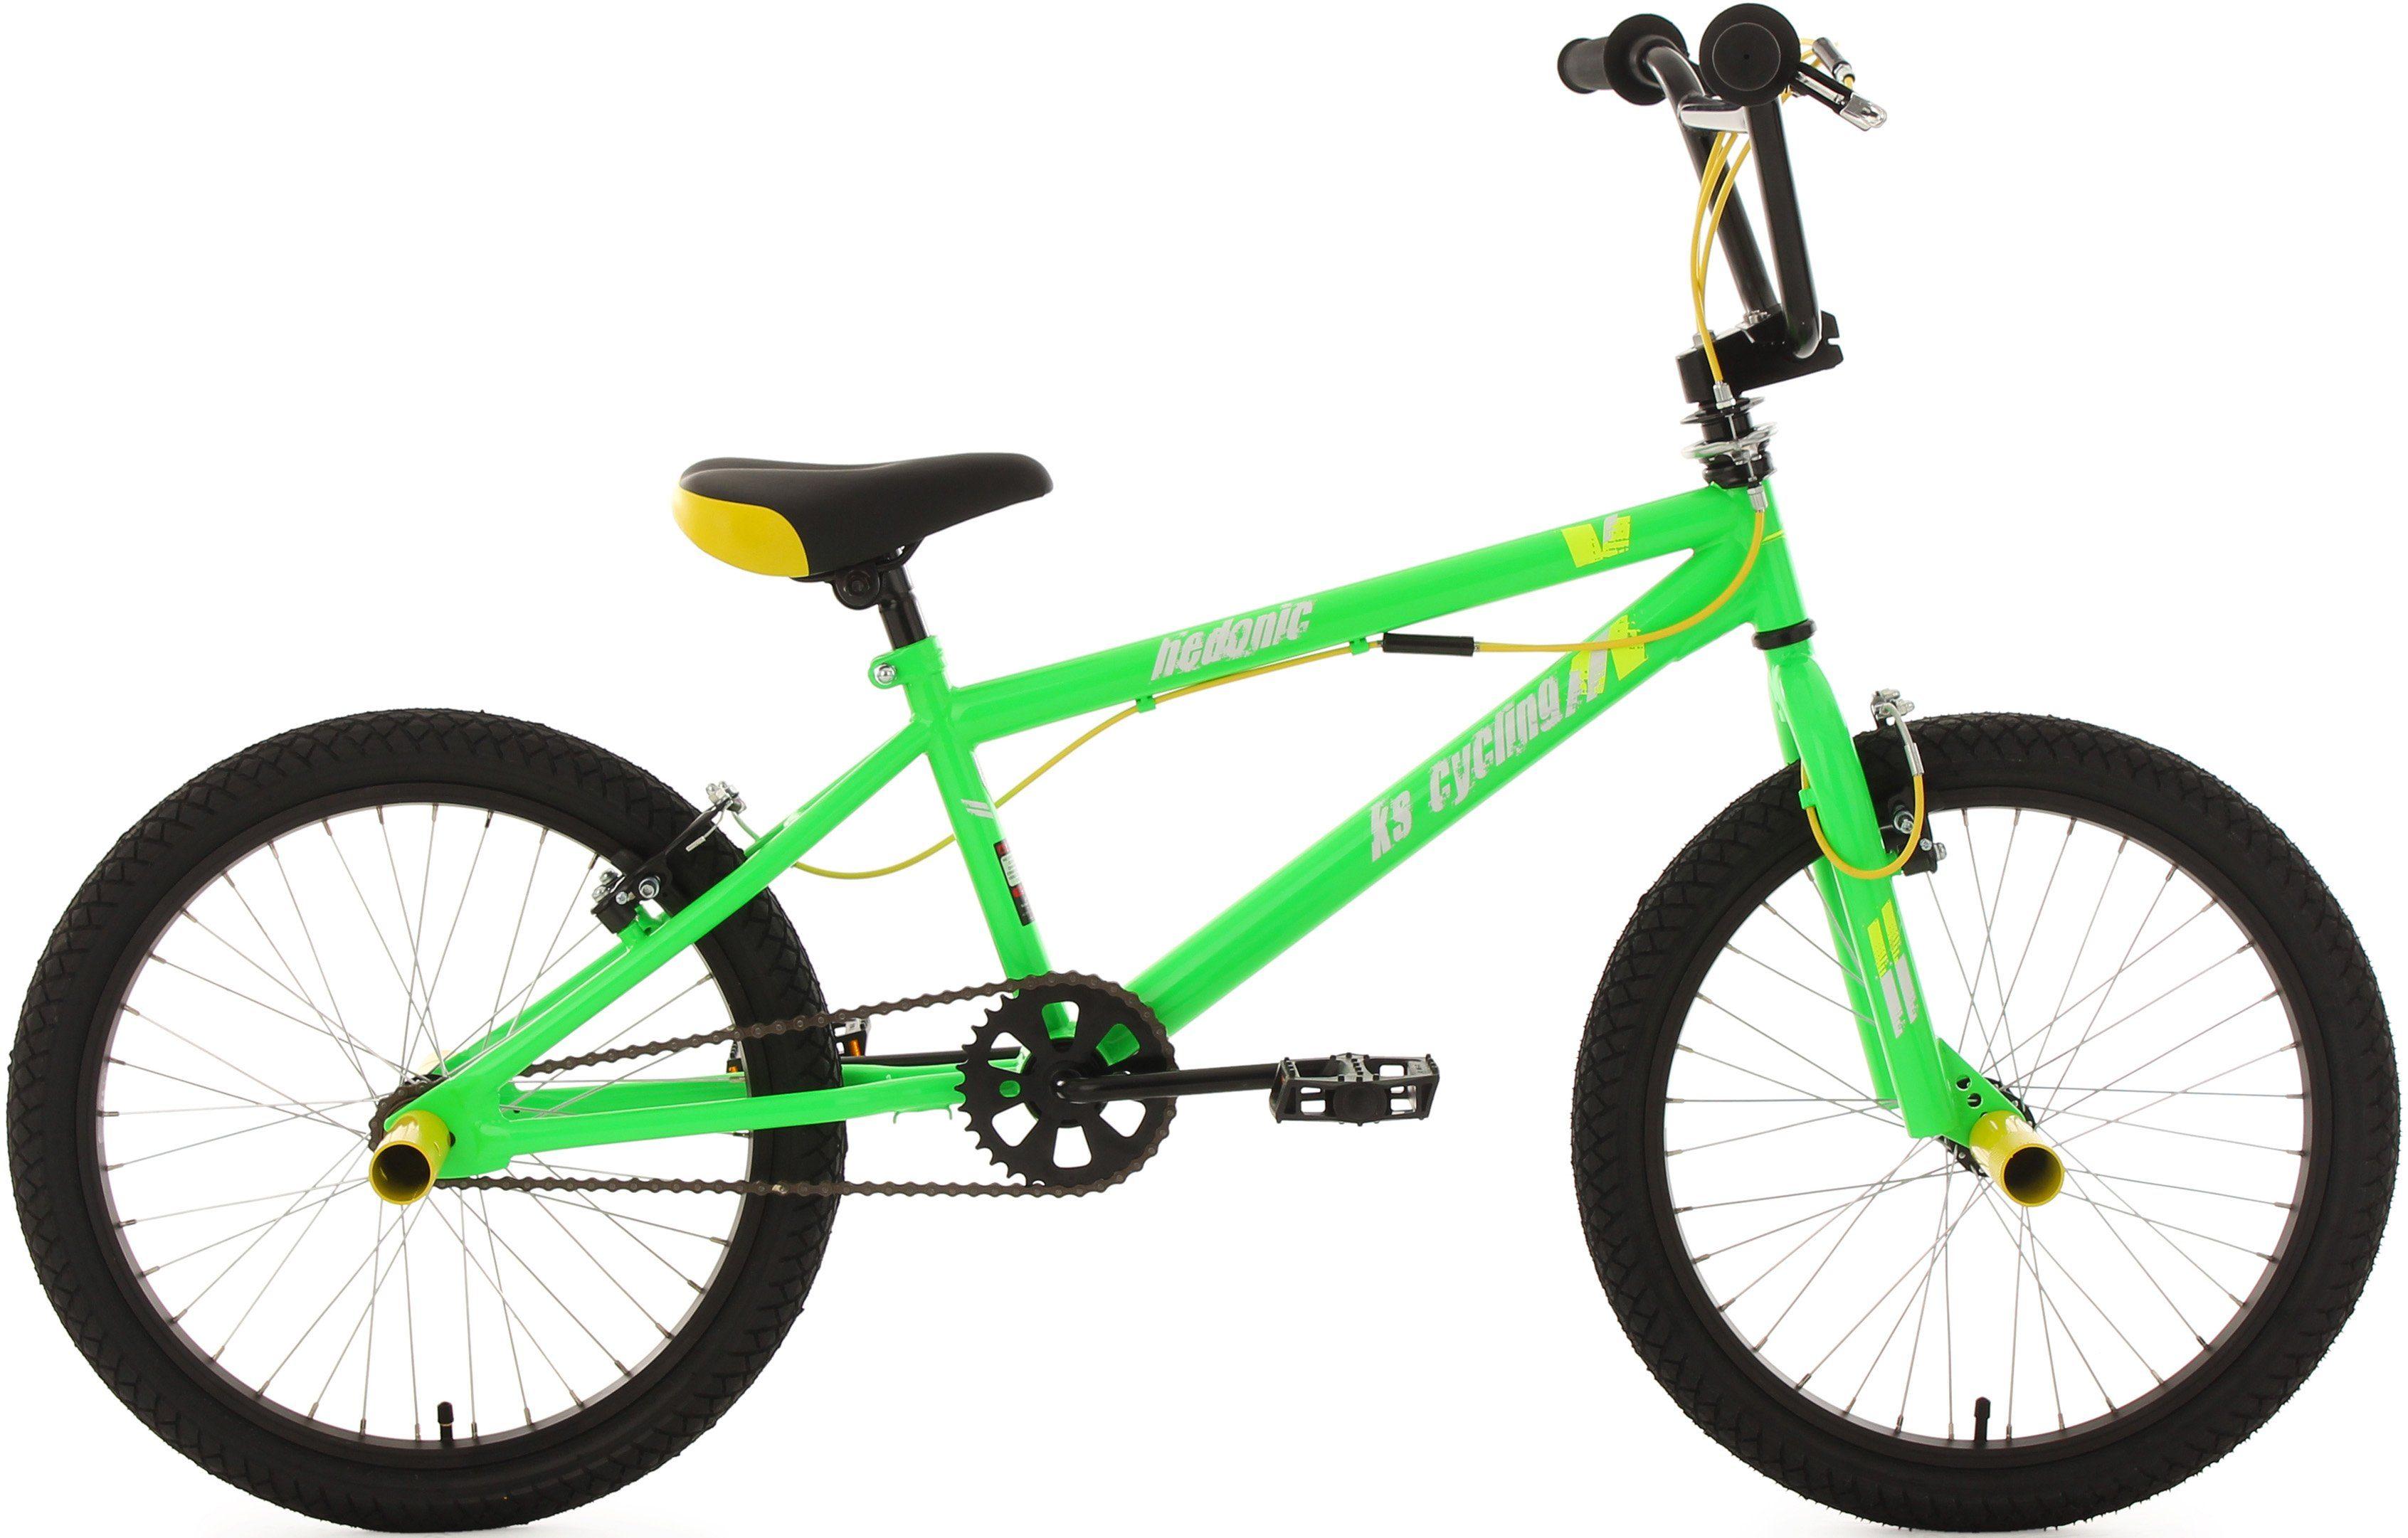 KS Cycling BMX Fahrrad, 20 Zoll, grün-gelb, »Hedonic«